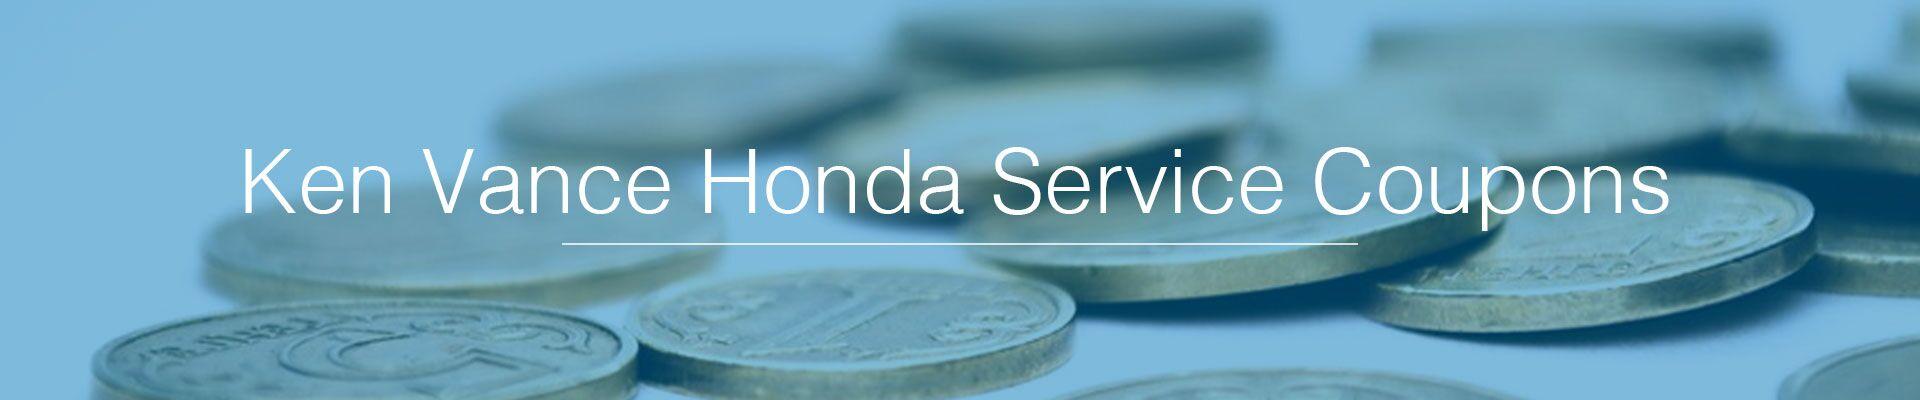 Ken Vance Honda Service Coupons